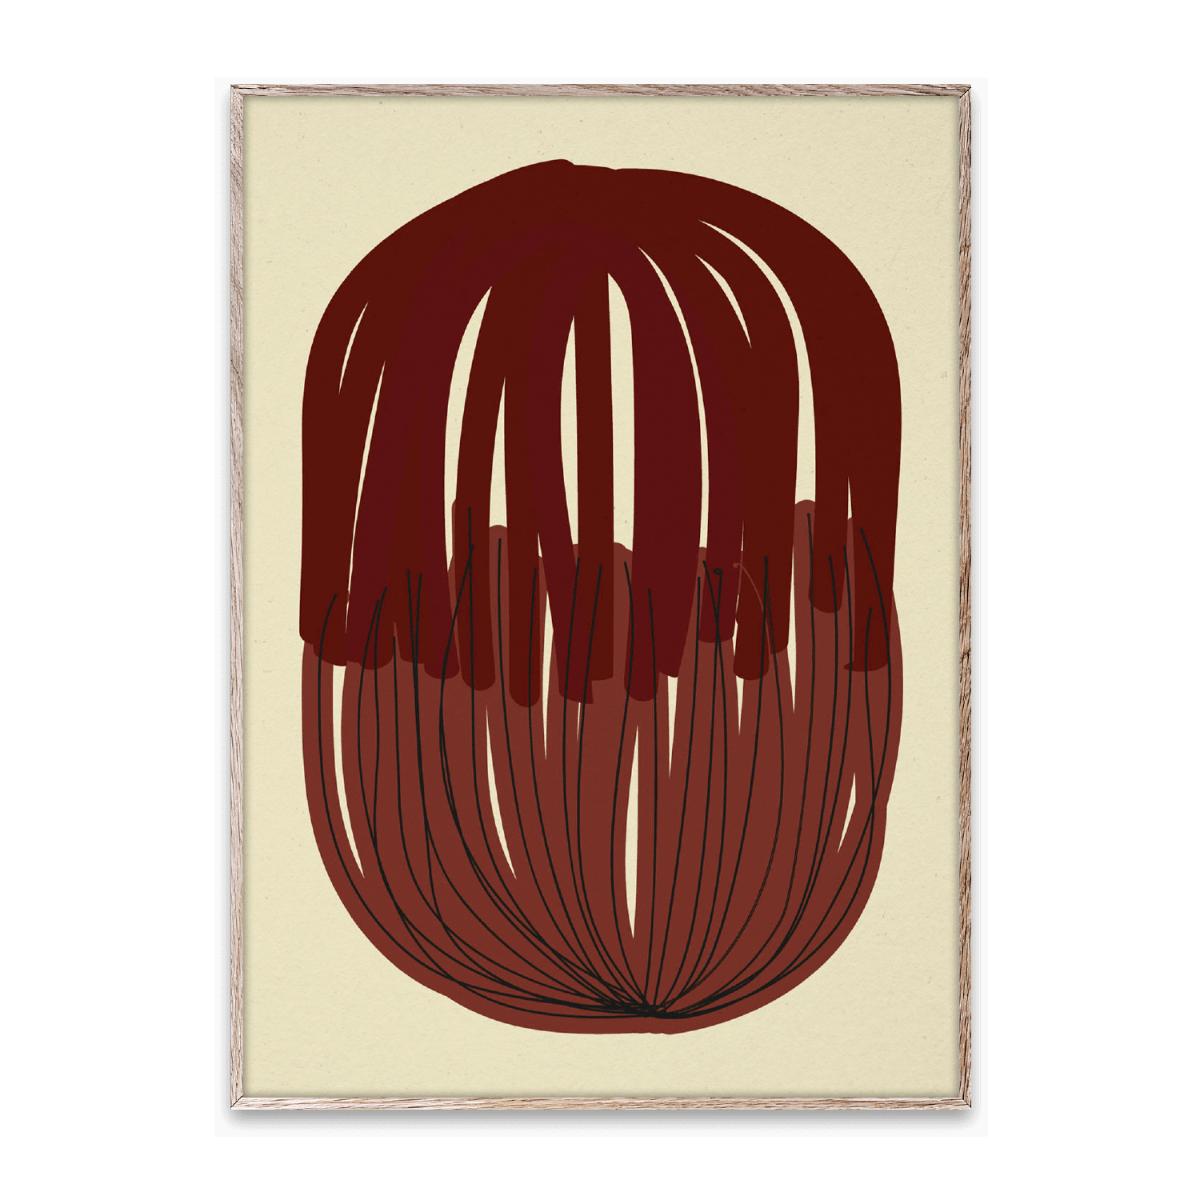 Designtorget Poster Stacked Lines 01 50x70 cm